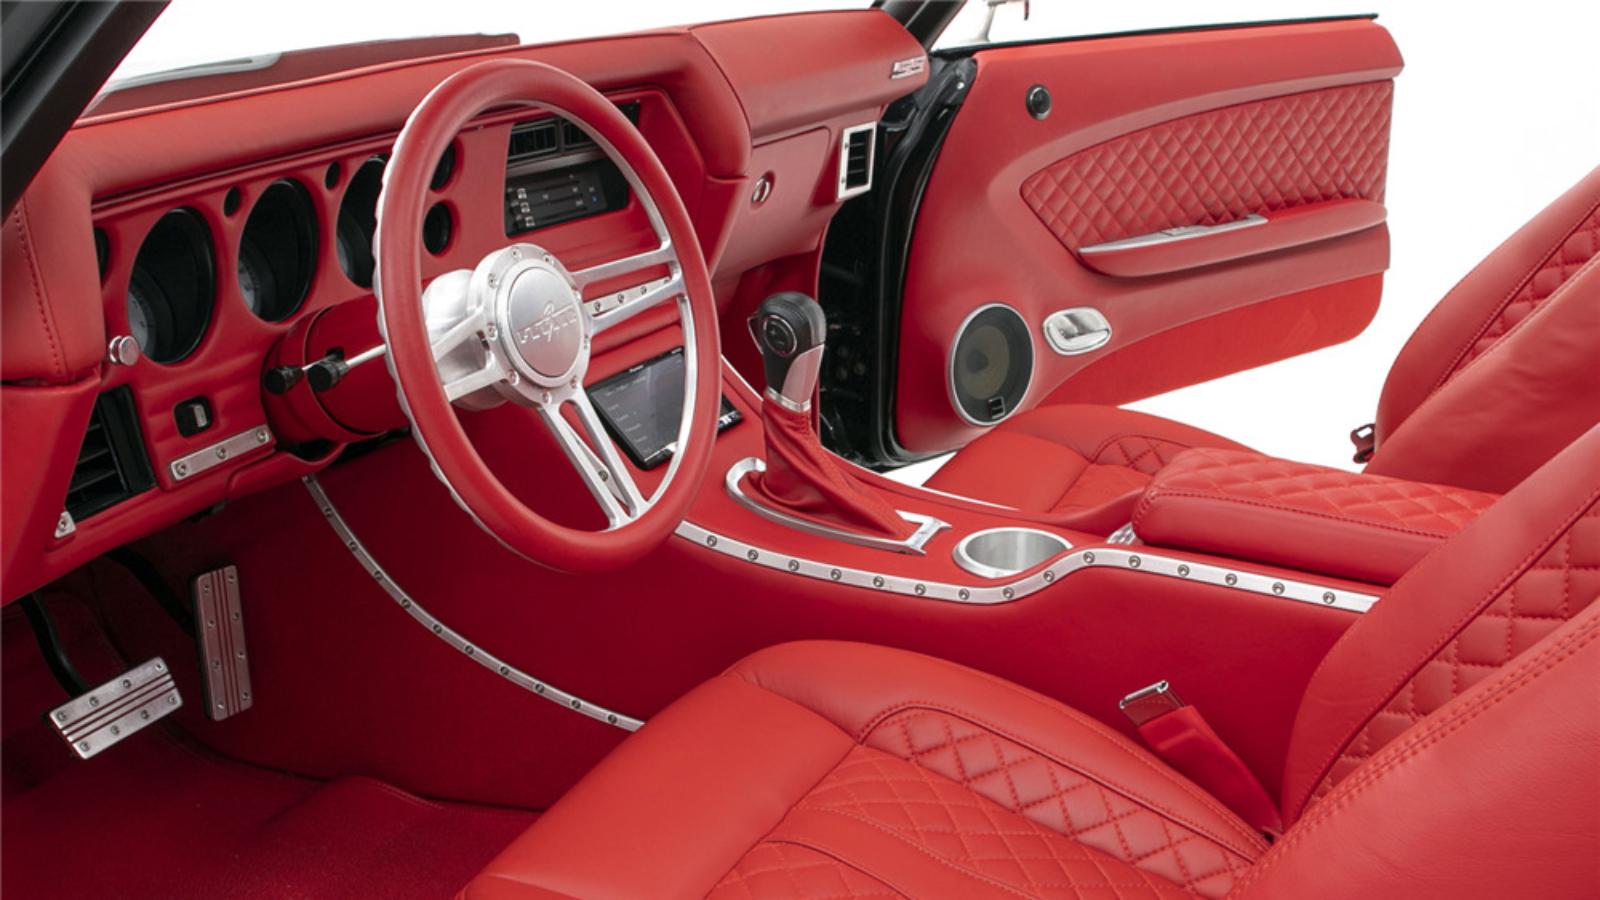 1970 Chevelle Restomod Boasts LS3 Power